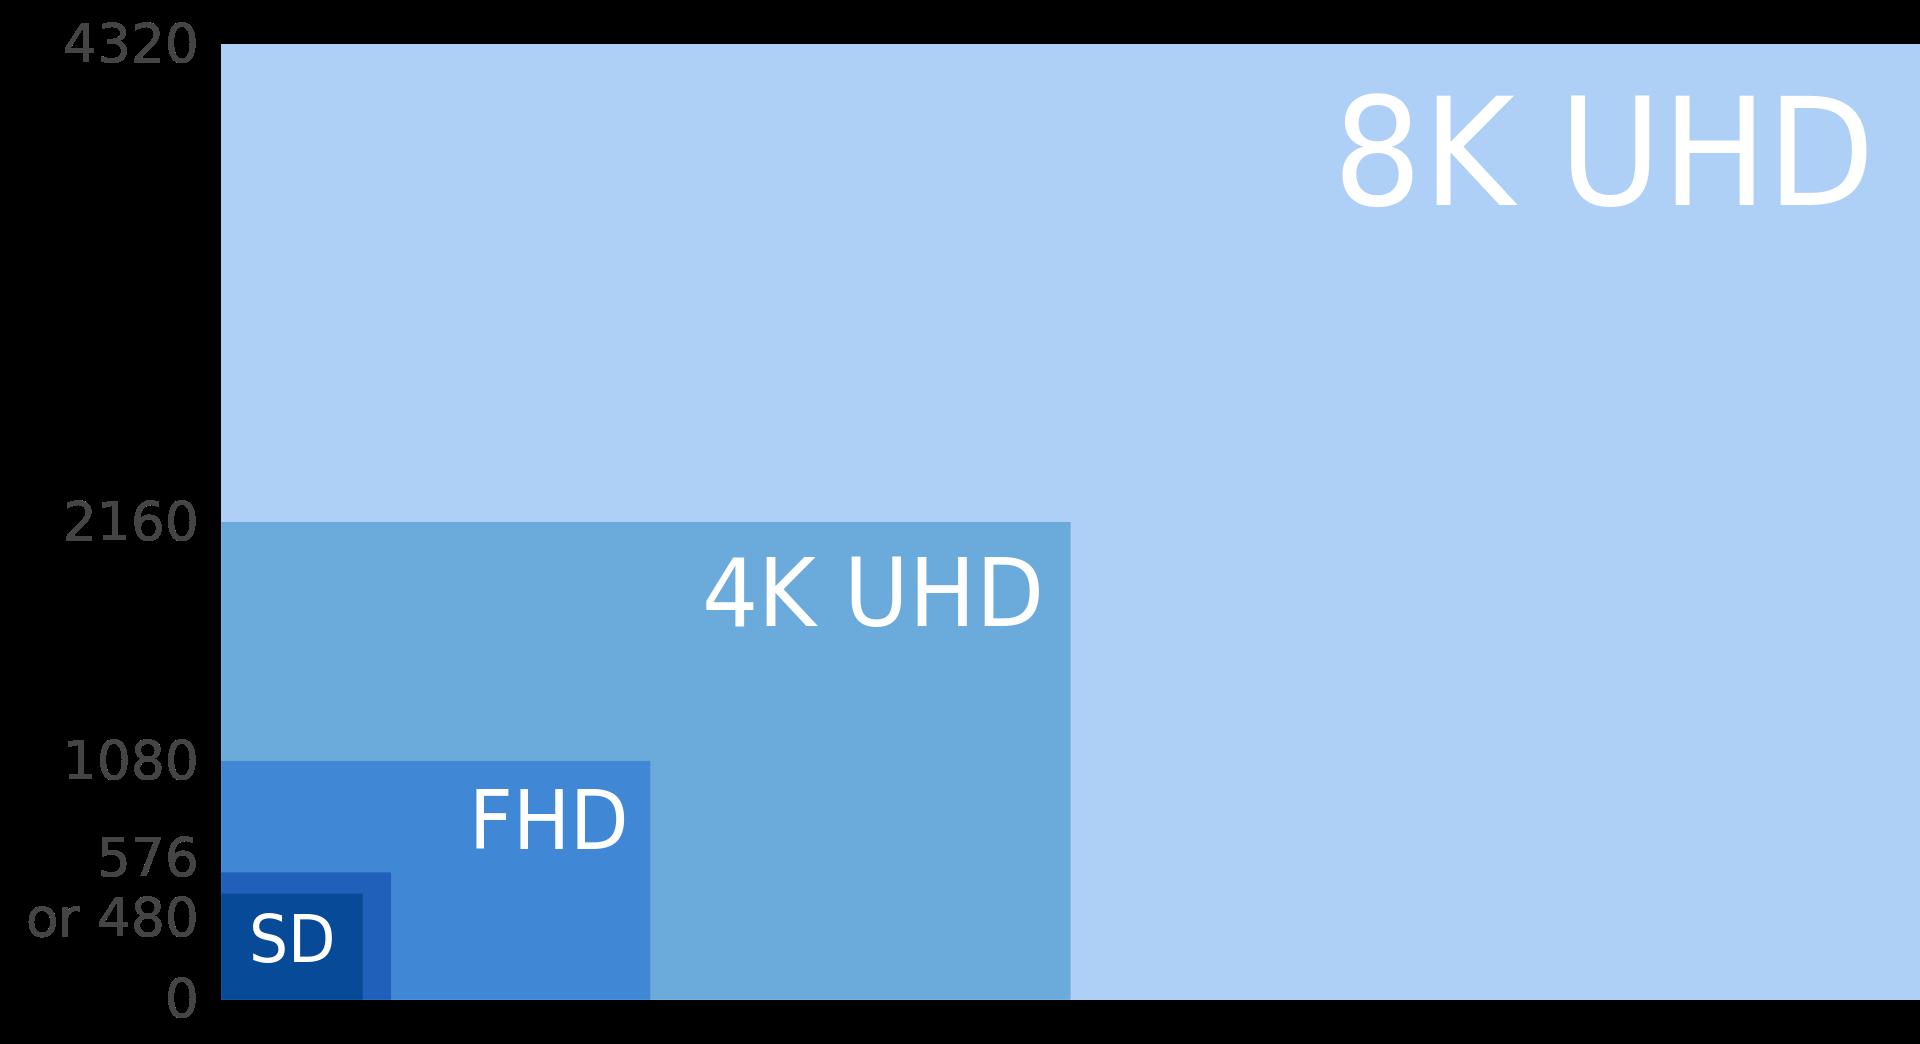 Źródło: https://en.wikipedia.org/wiki/8K_resolution